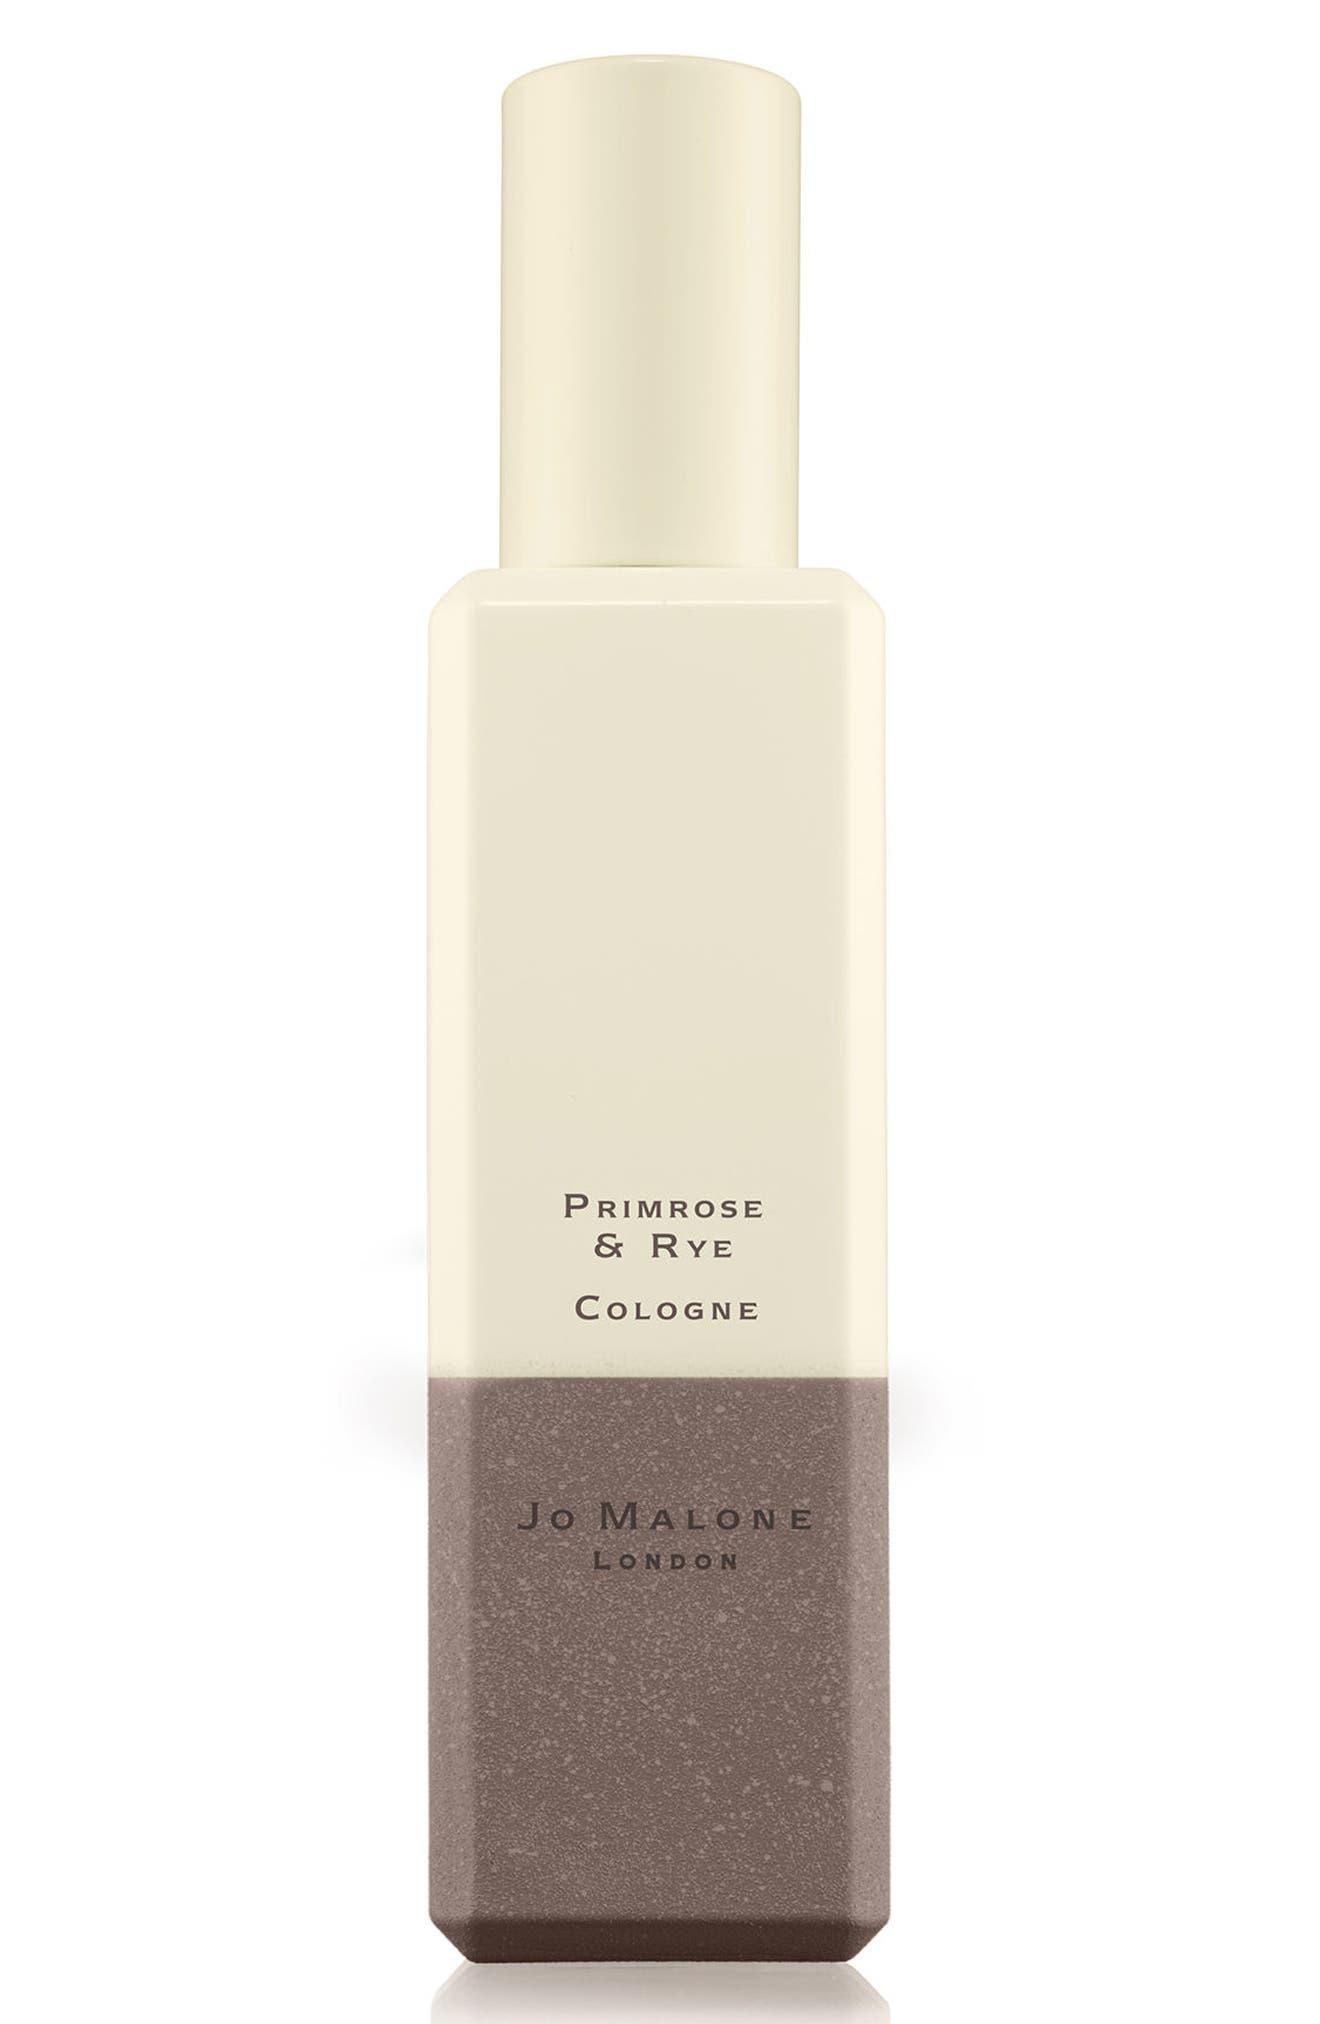 Jo Malone London™ Primrose & Rye Cologne (Limited Edition)